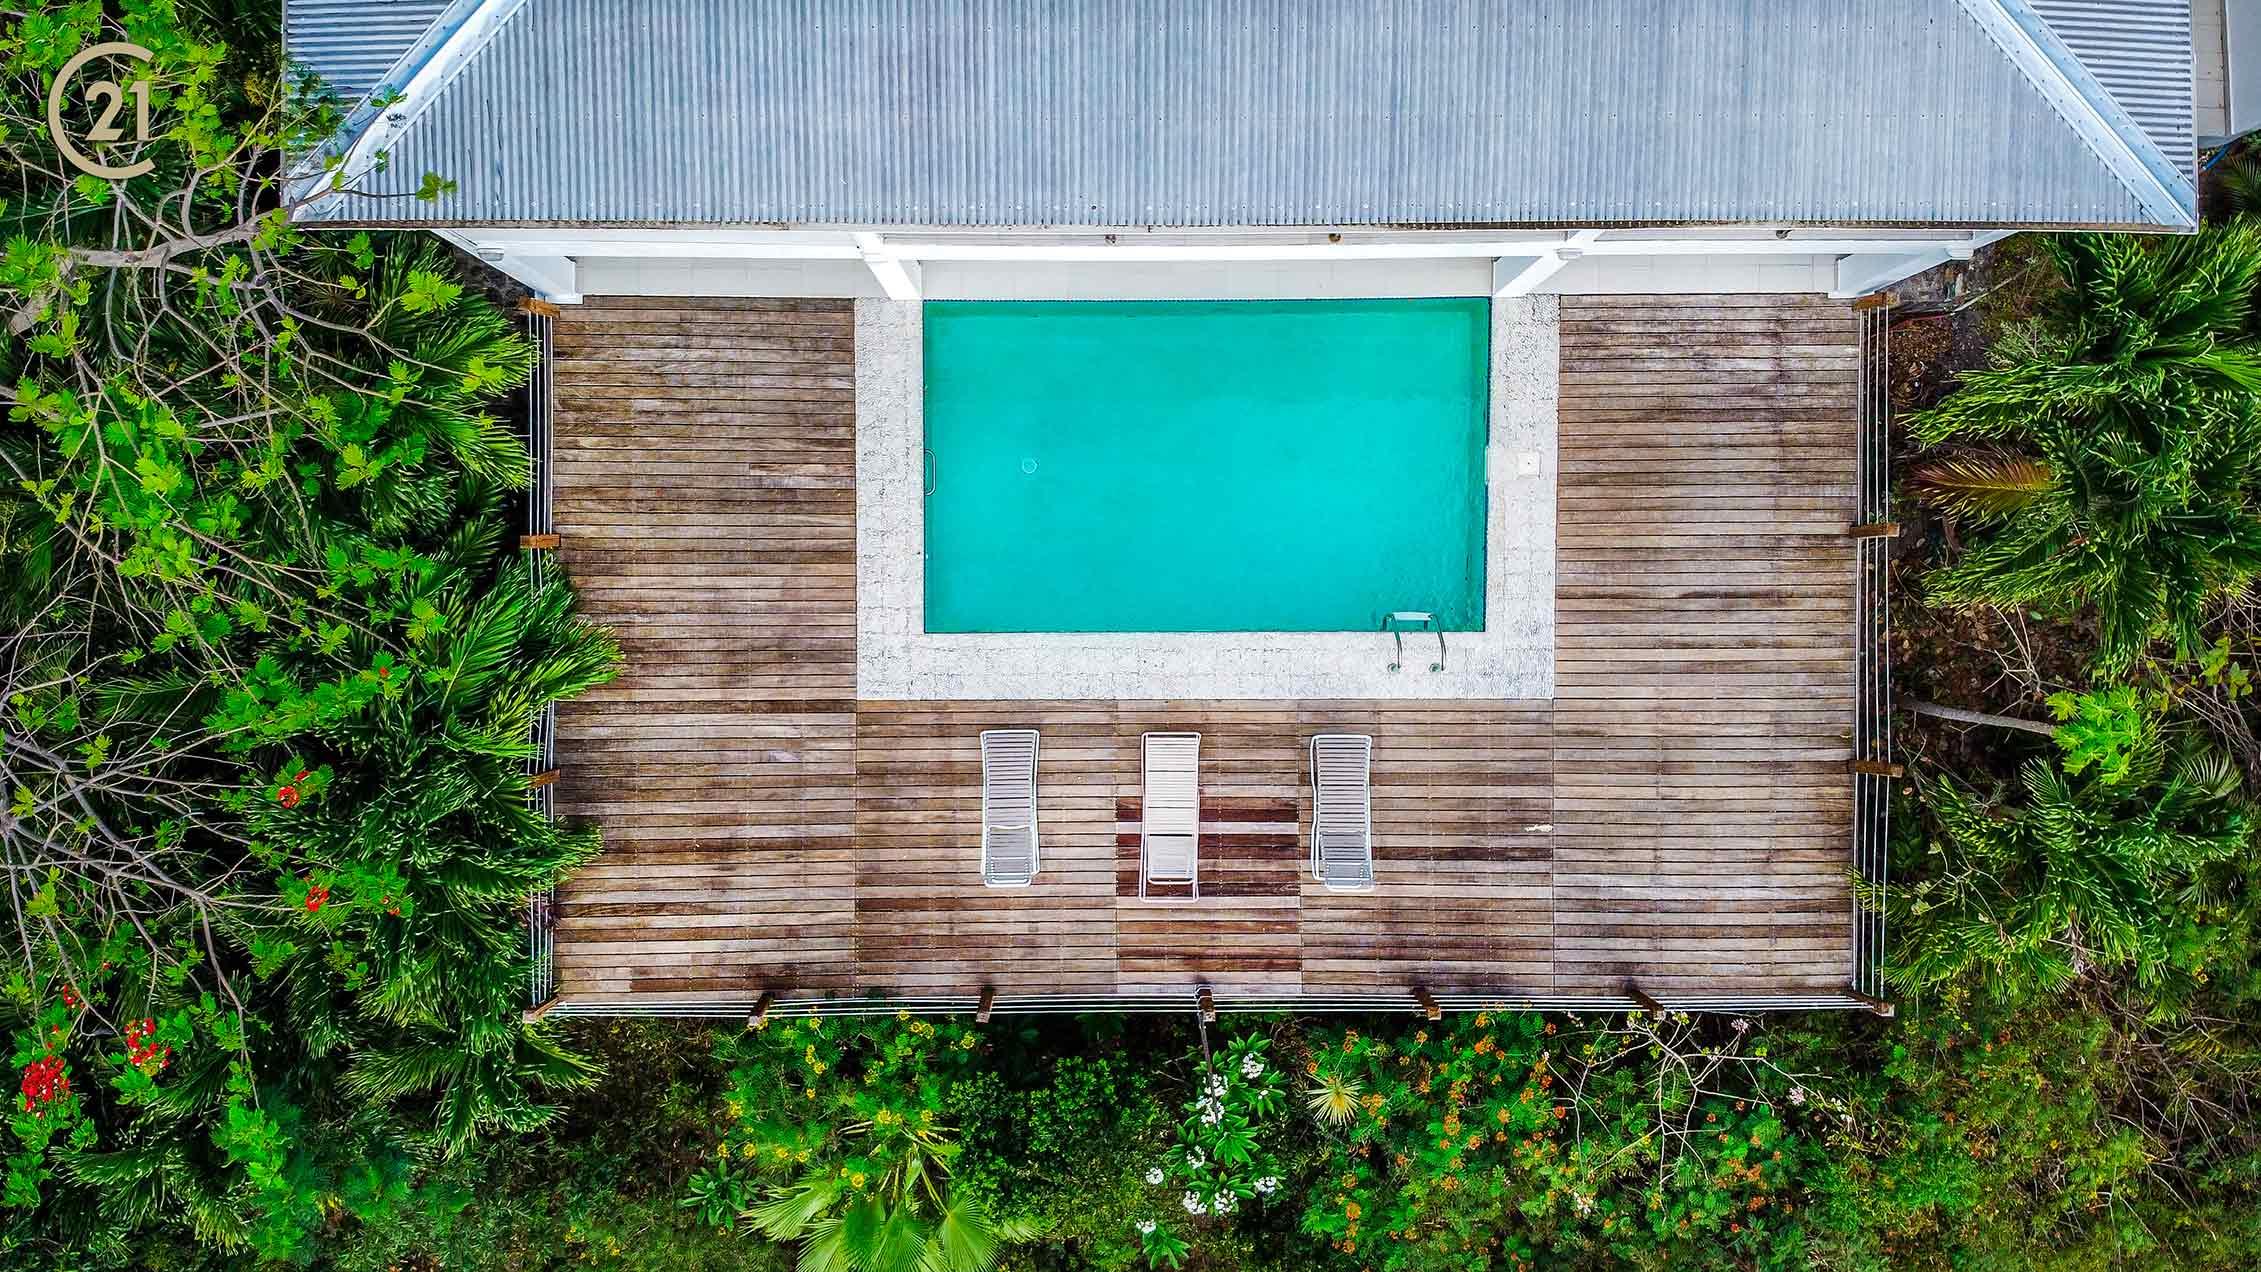 Villa Magnifique – Almond Grove Estate – A Modern Villa